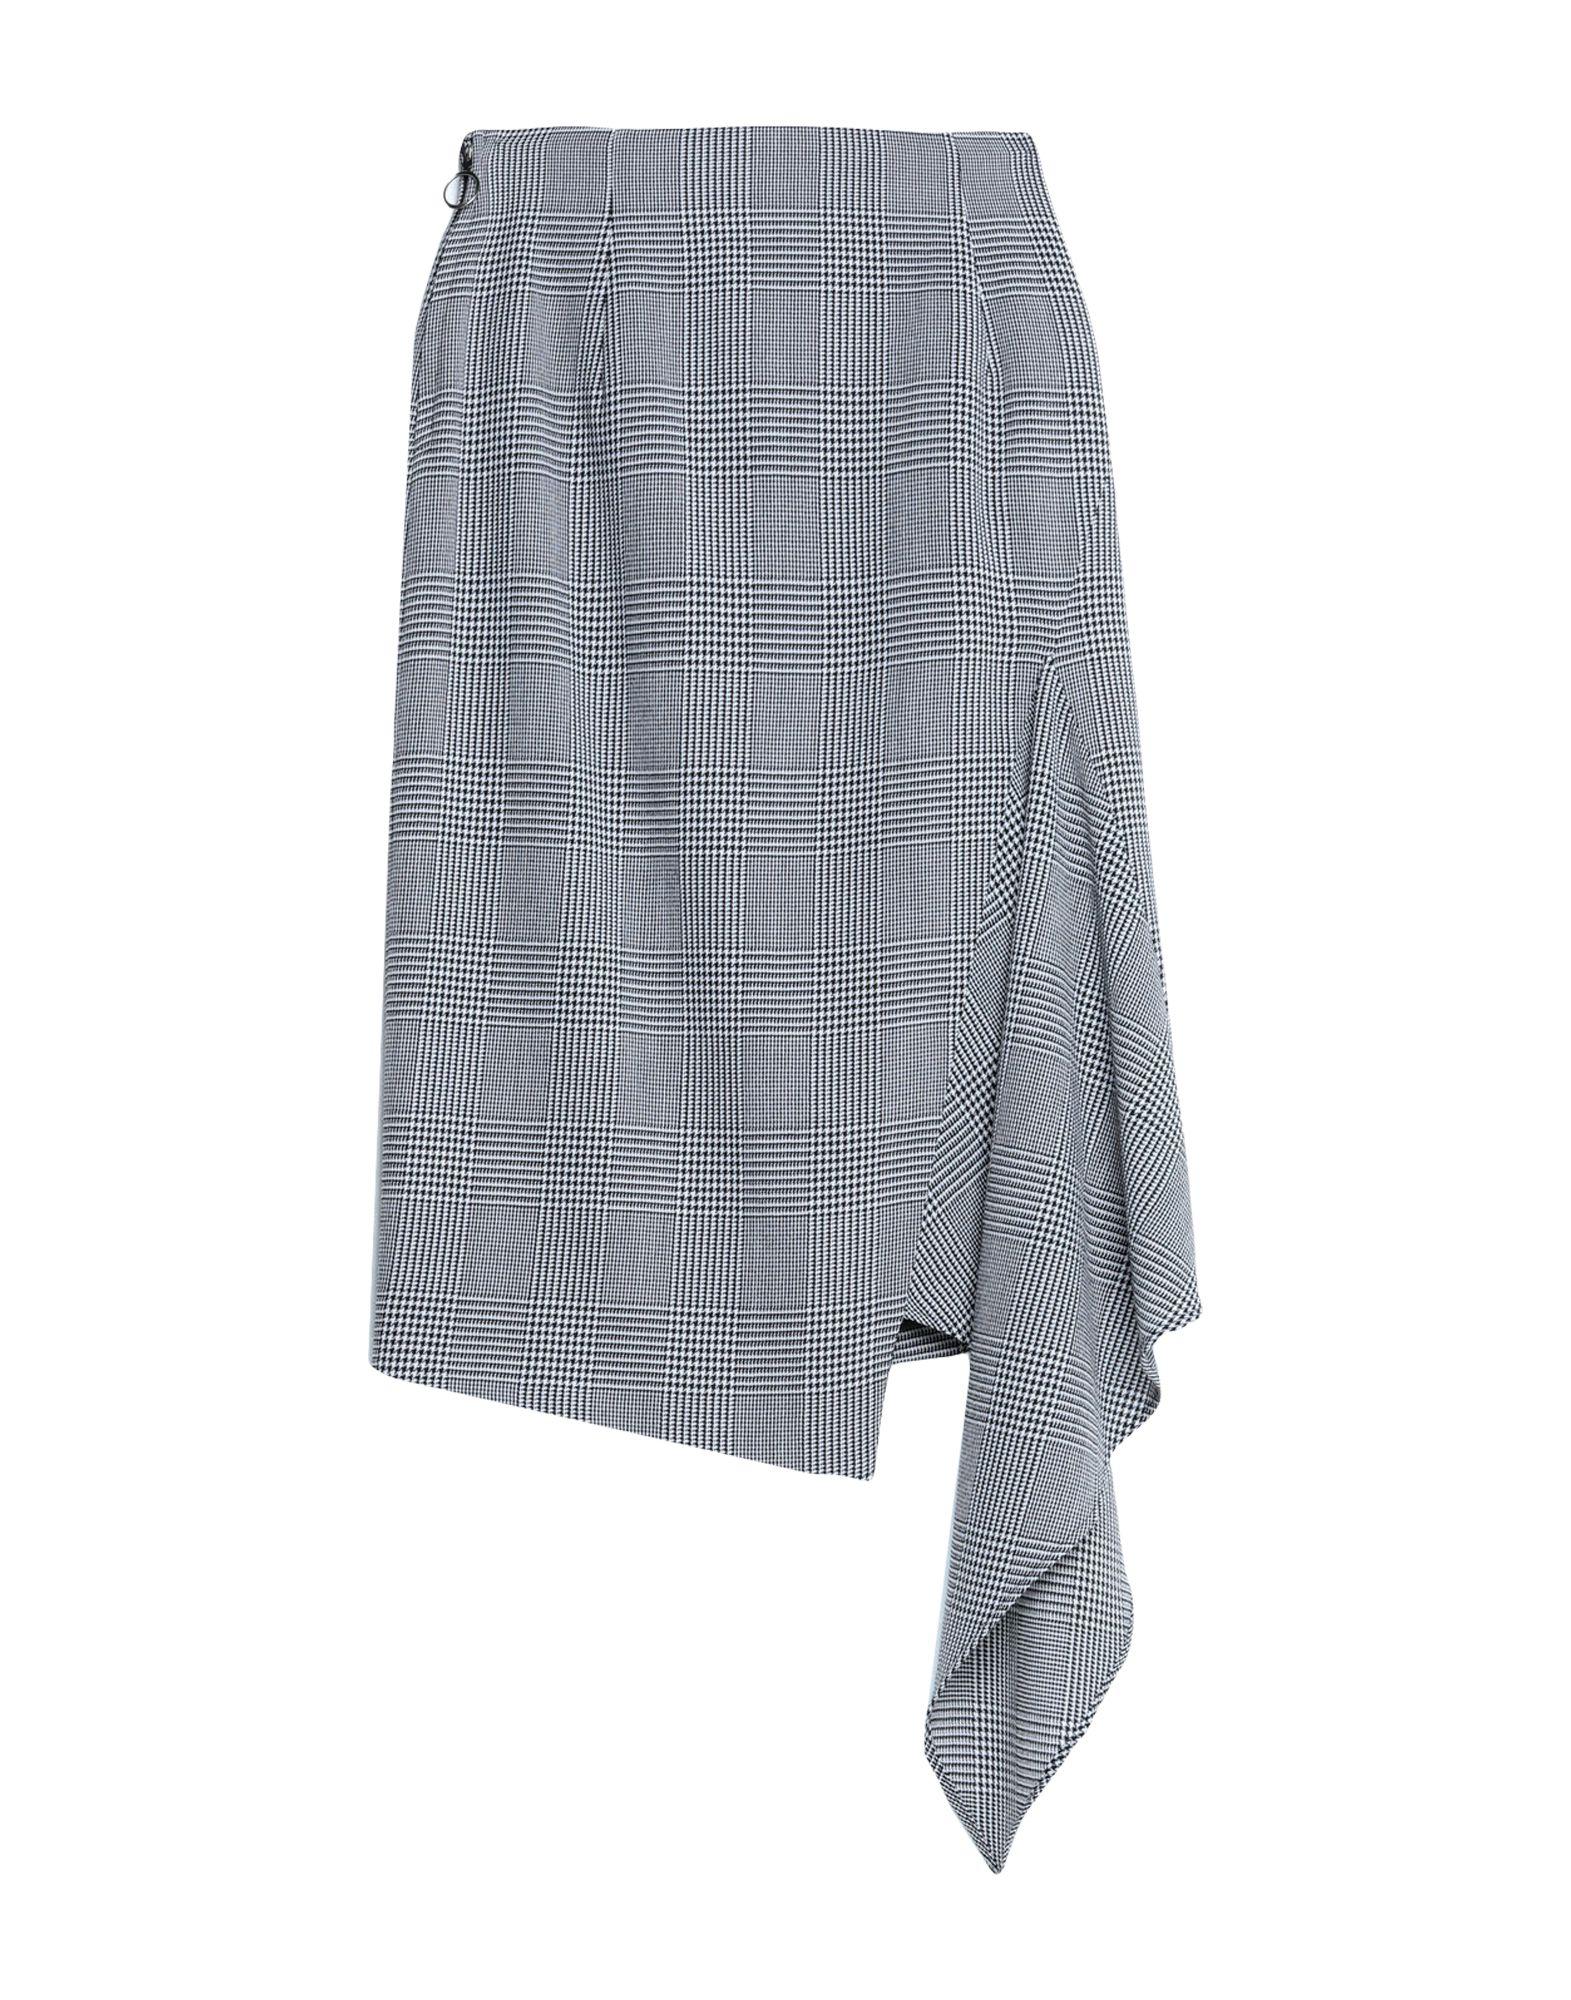 OFF-WHITE™ Юбка длиной 3/4 off white™ мини юбка